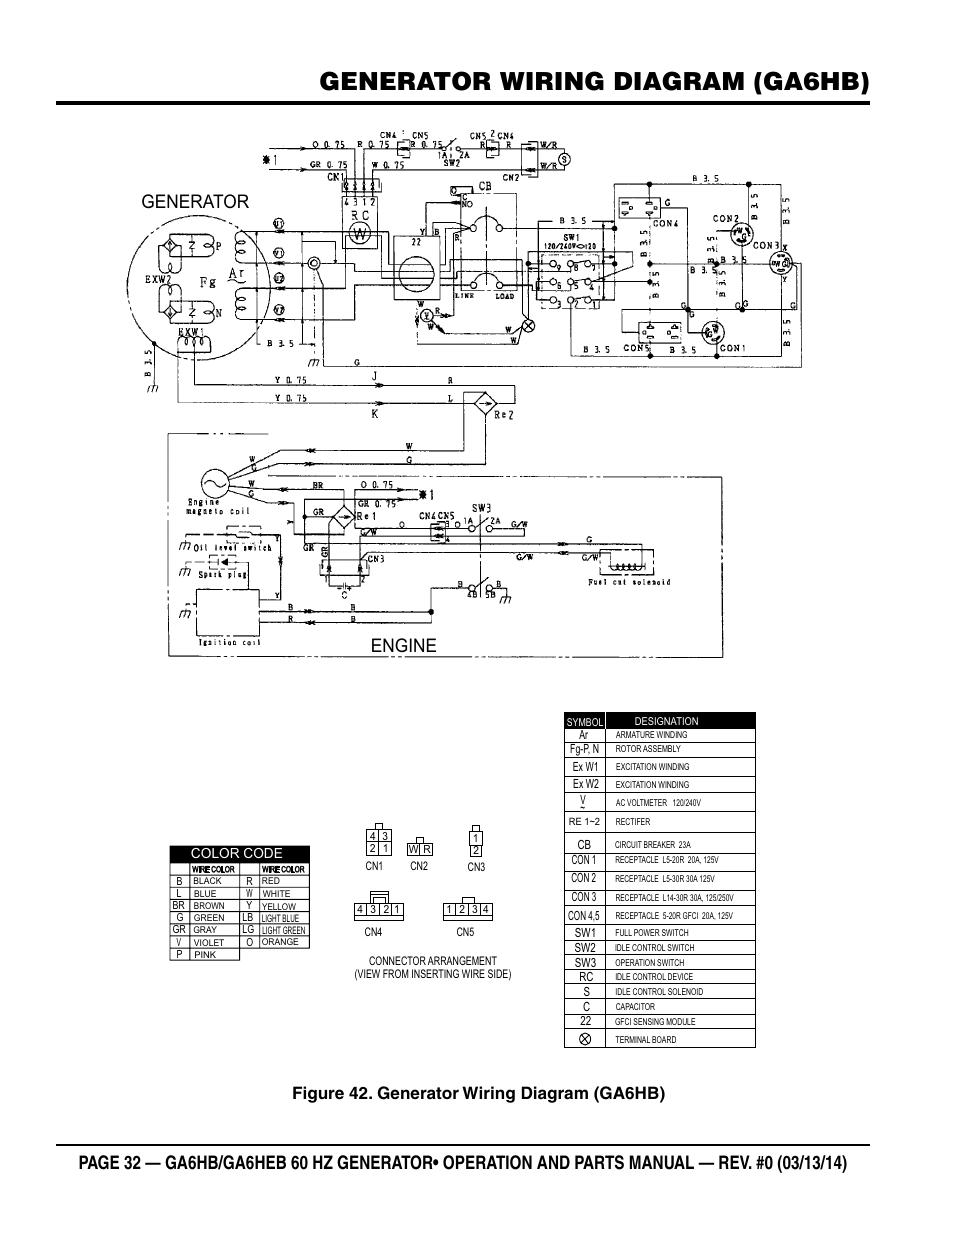 medium resolution of generator wiring diagram ga6hb generator engine figure 42 generator wiring diagram ga6hb multiquip ga 6heb user manual page 32 86